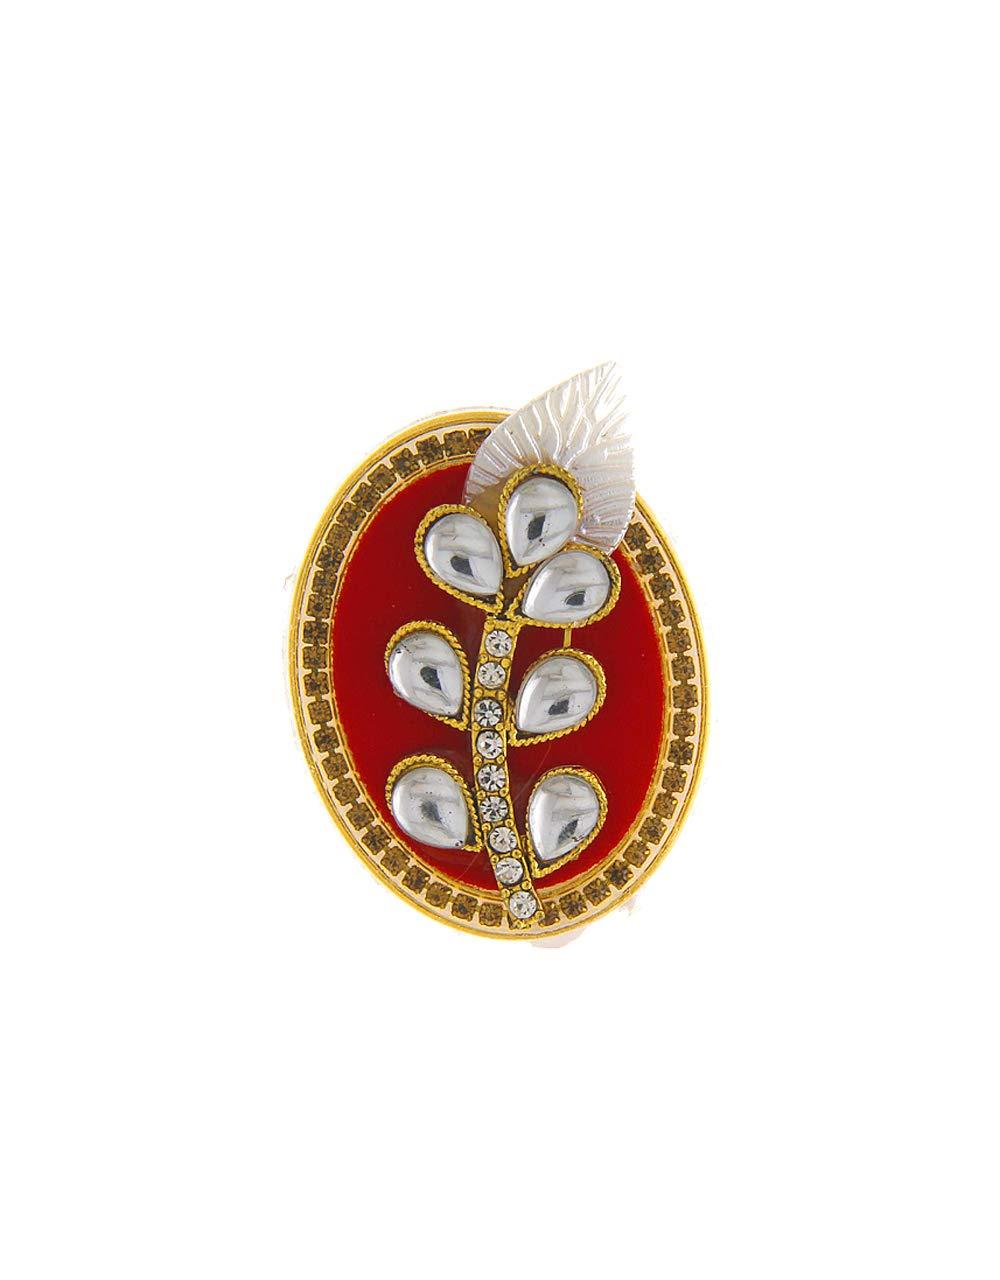 Anuradha Art Red Colour Oval Shape Wonderful Adorable Sari/Saree Pin for Women/Girls